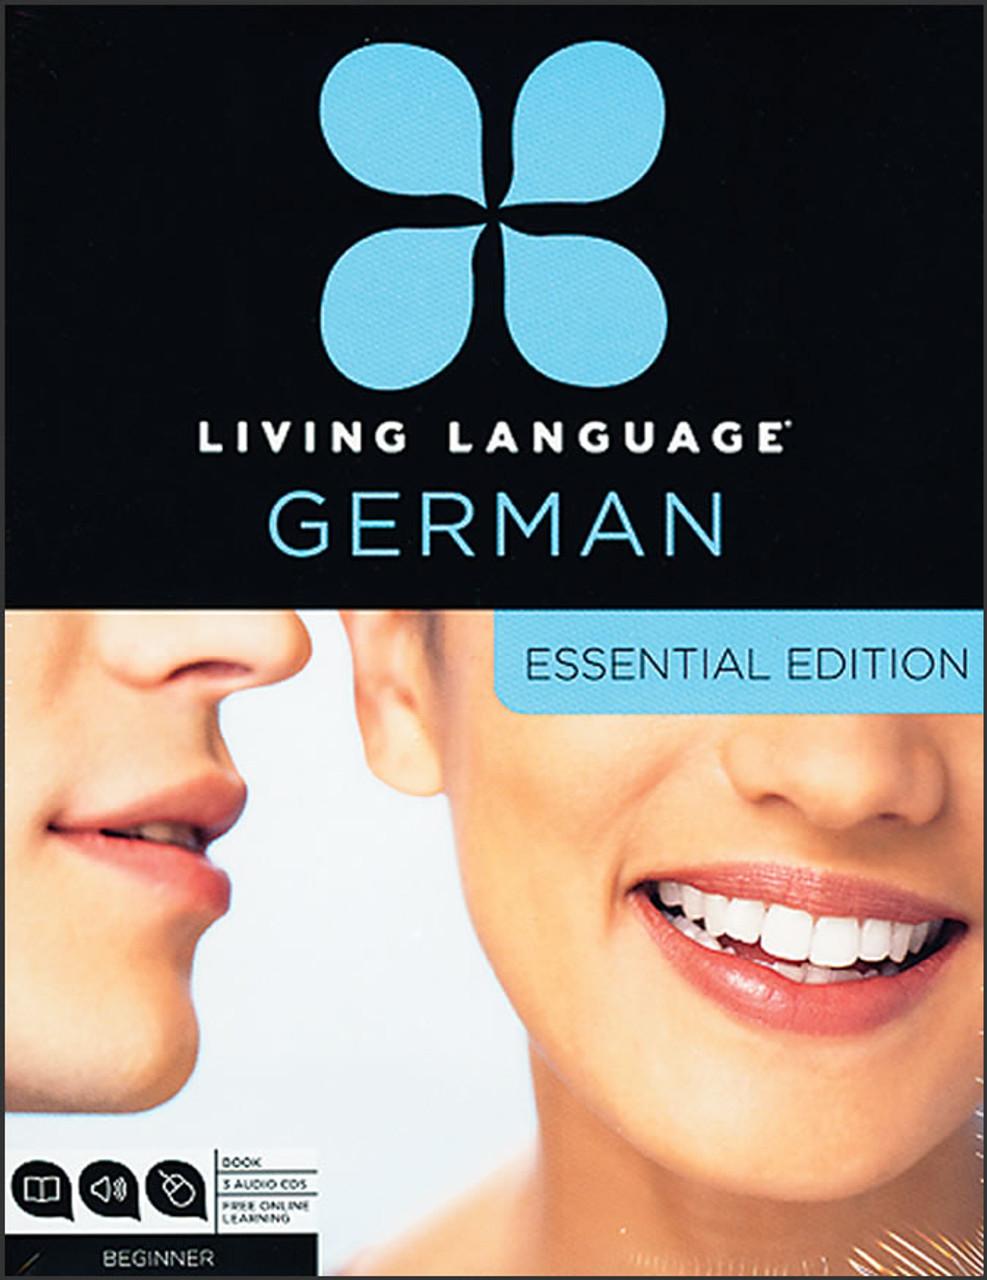 Living Language German: Essential Edition